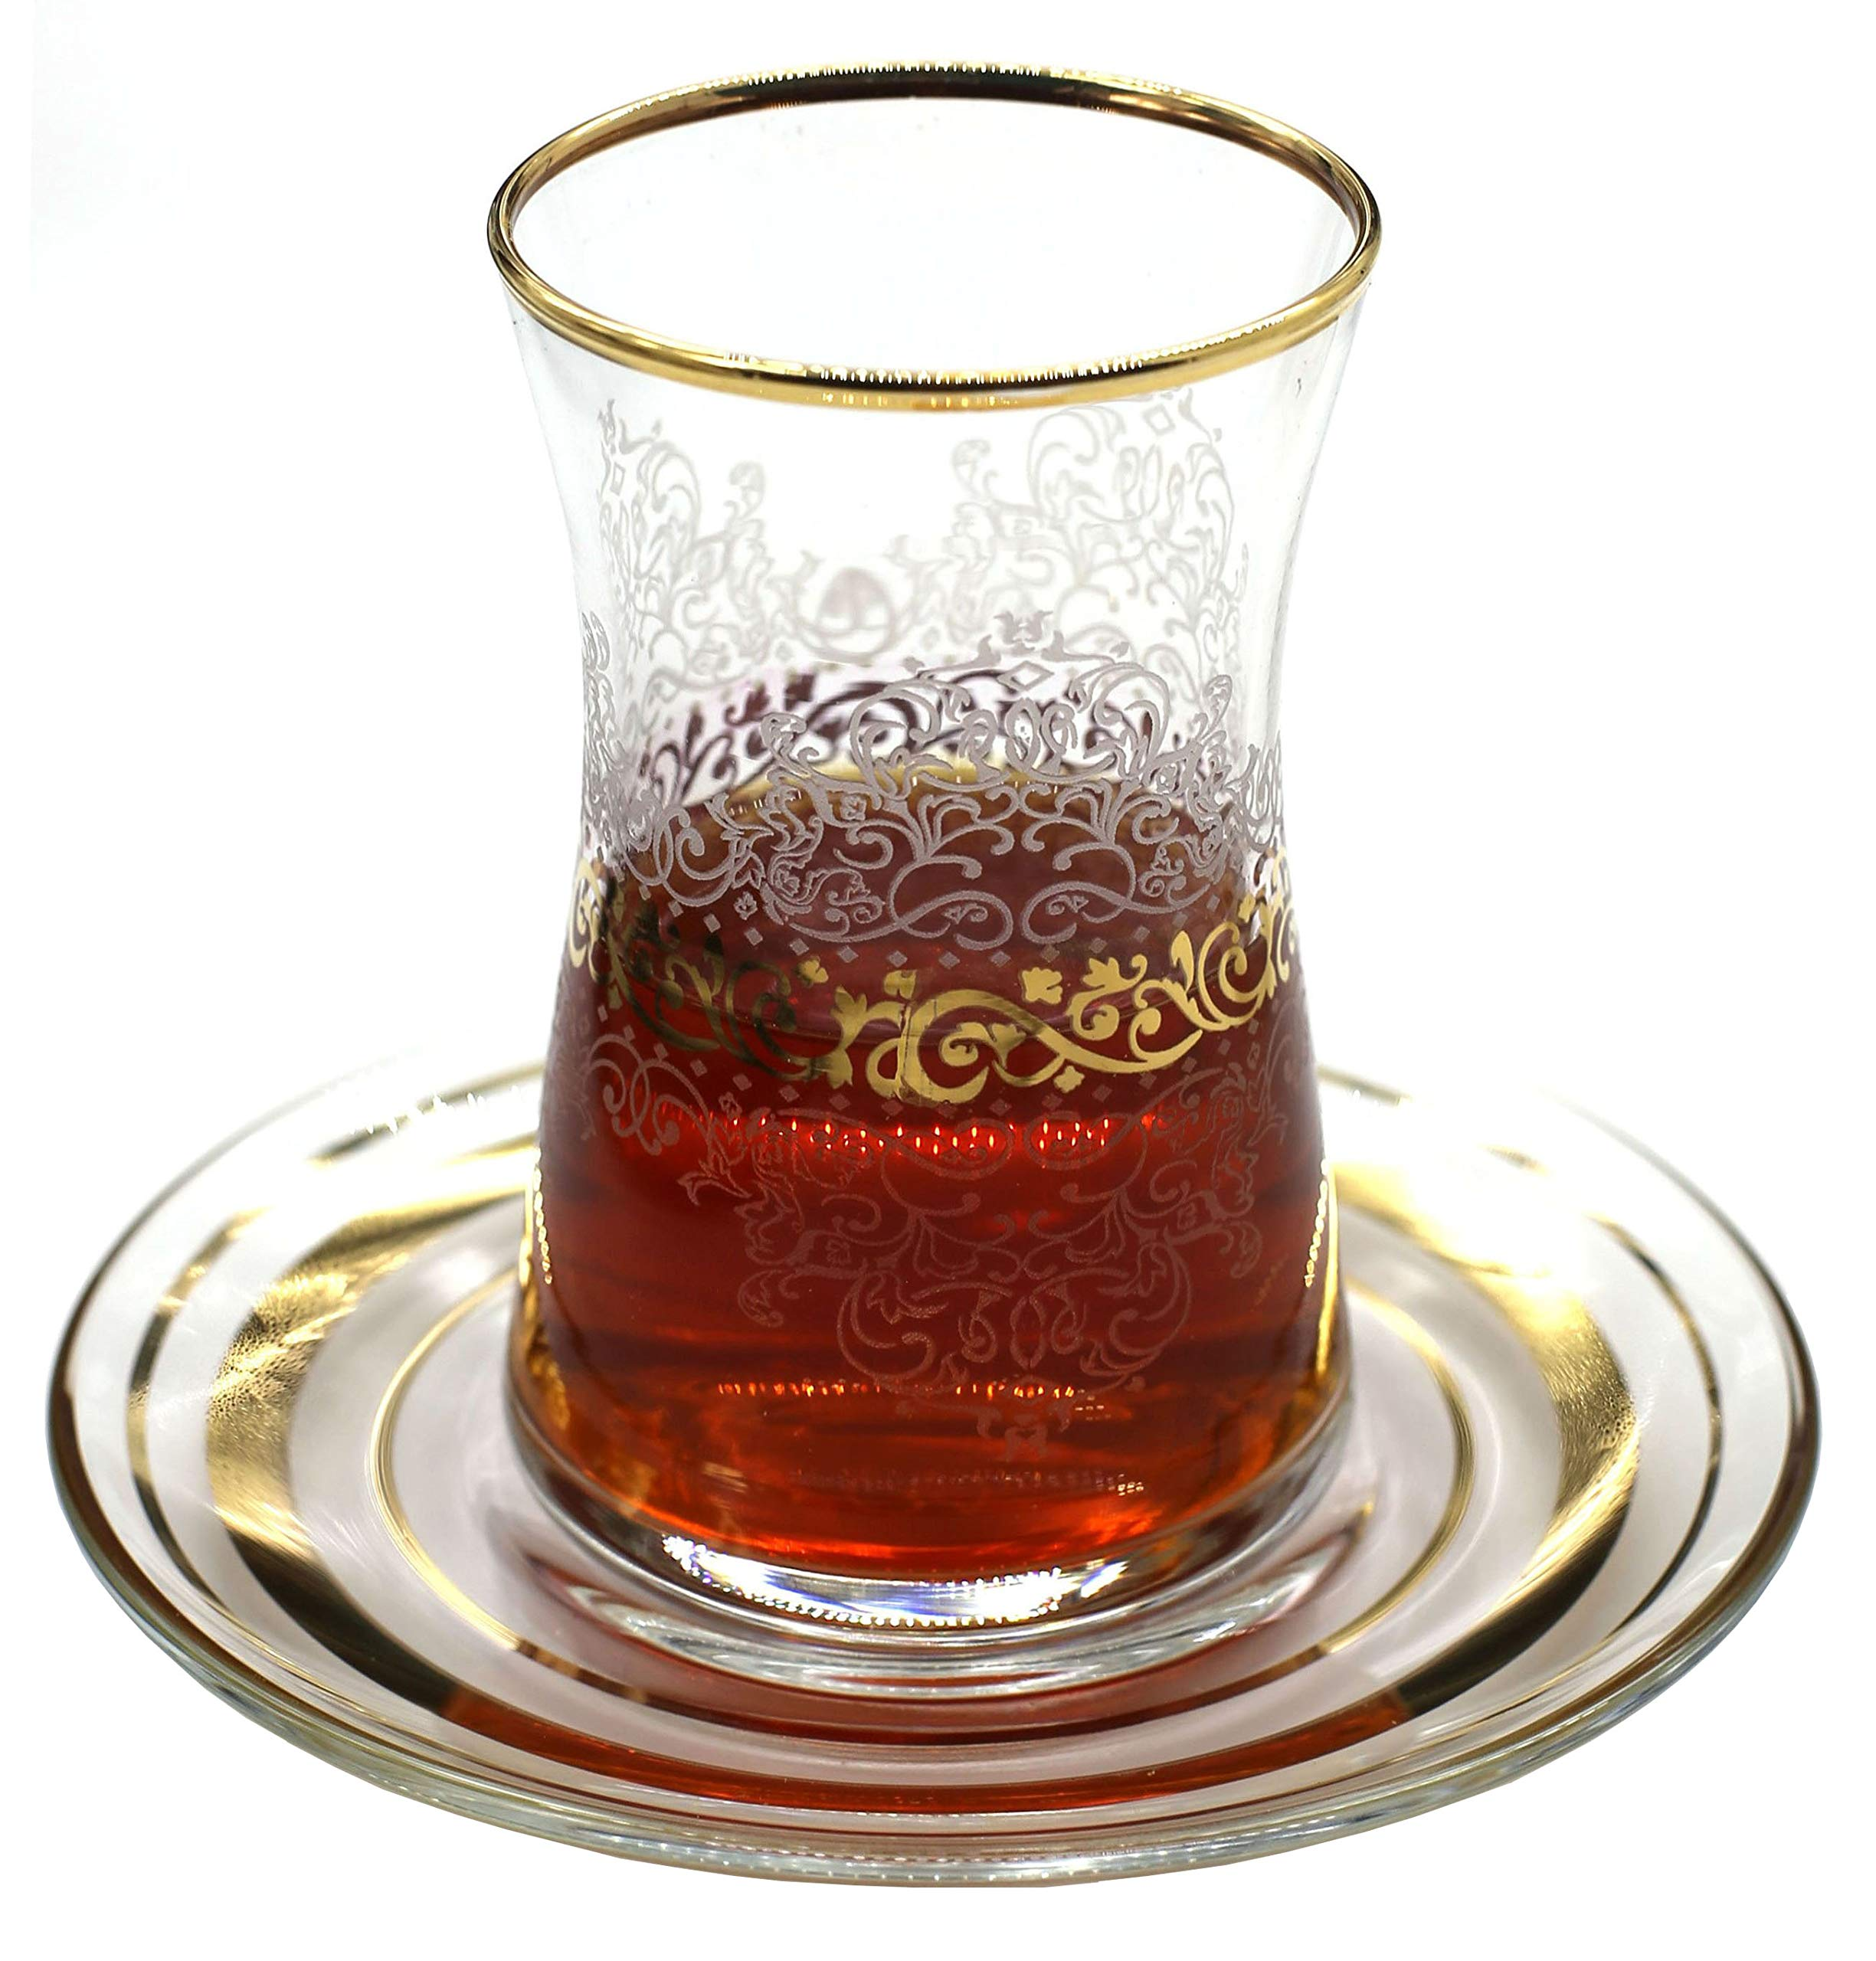 Estel Gold Turkish Tea Glasses with Saucers Set (Set of 6) 5 Ounce